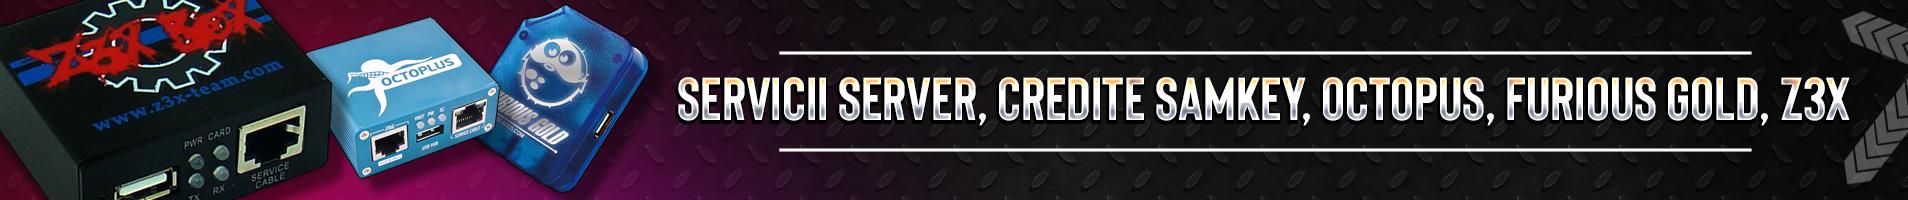 Servicii Server